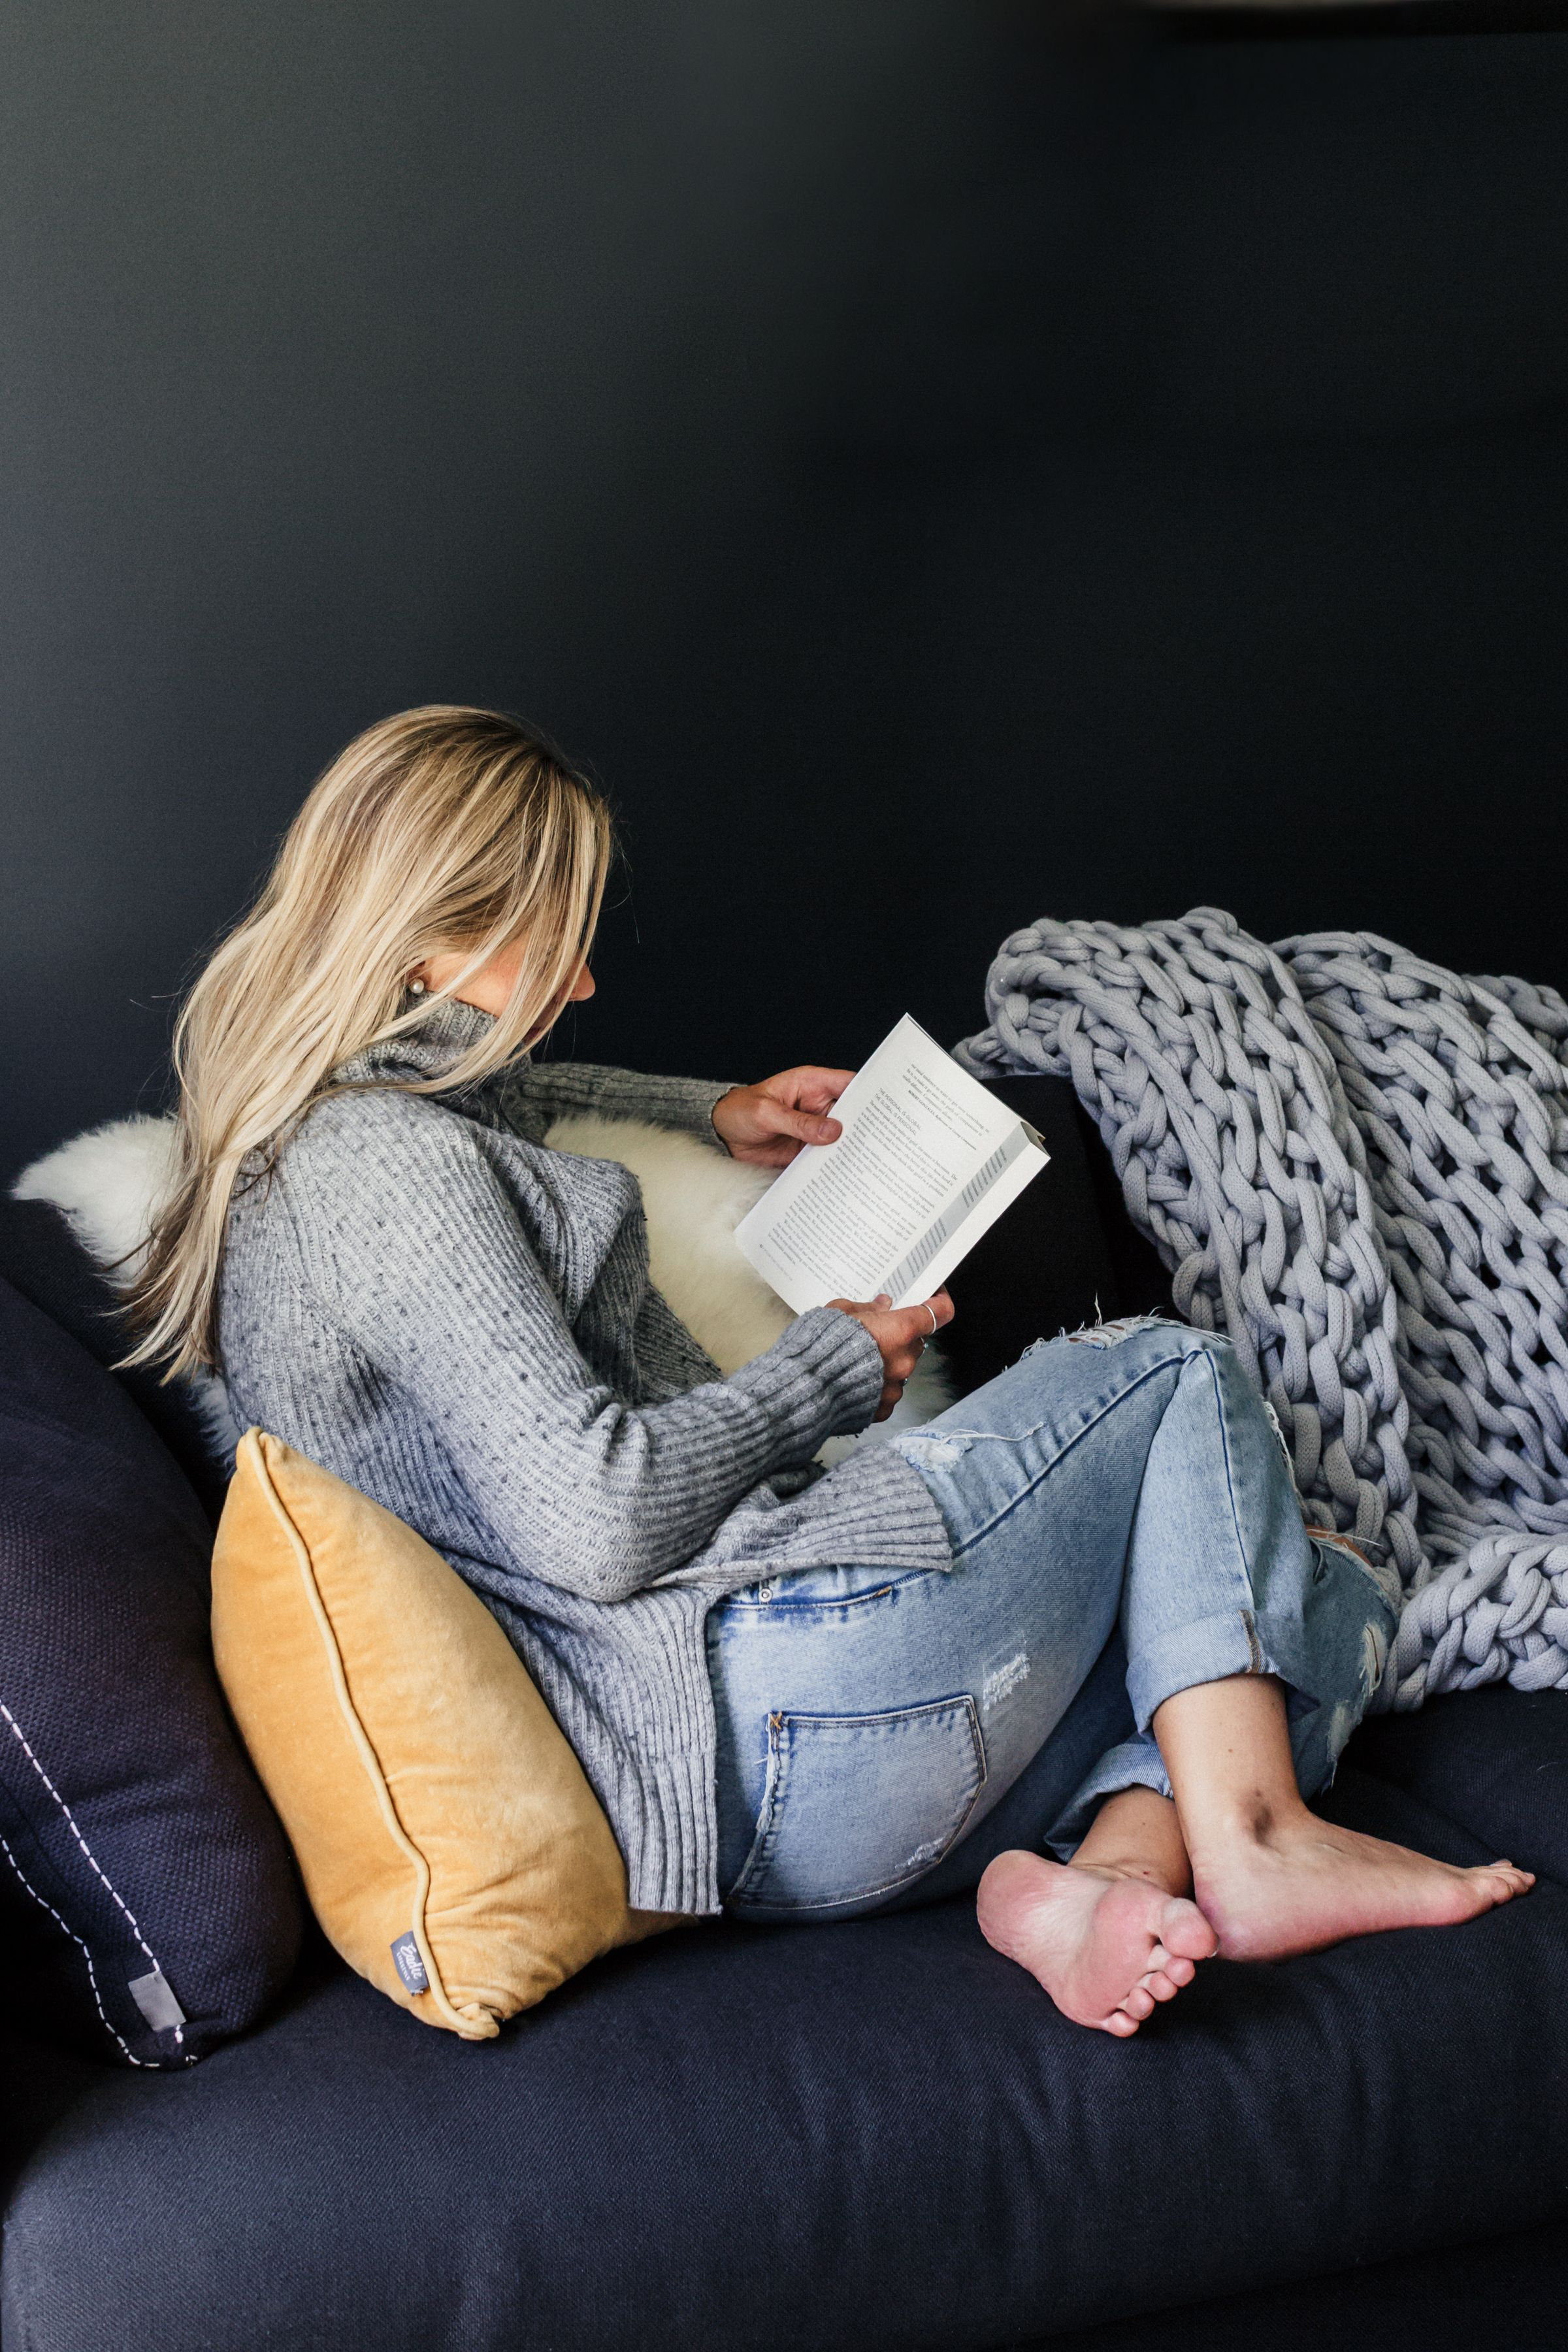 883f2c2fb1e7 Yishan Chan Photography - woman reading a book on sofa